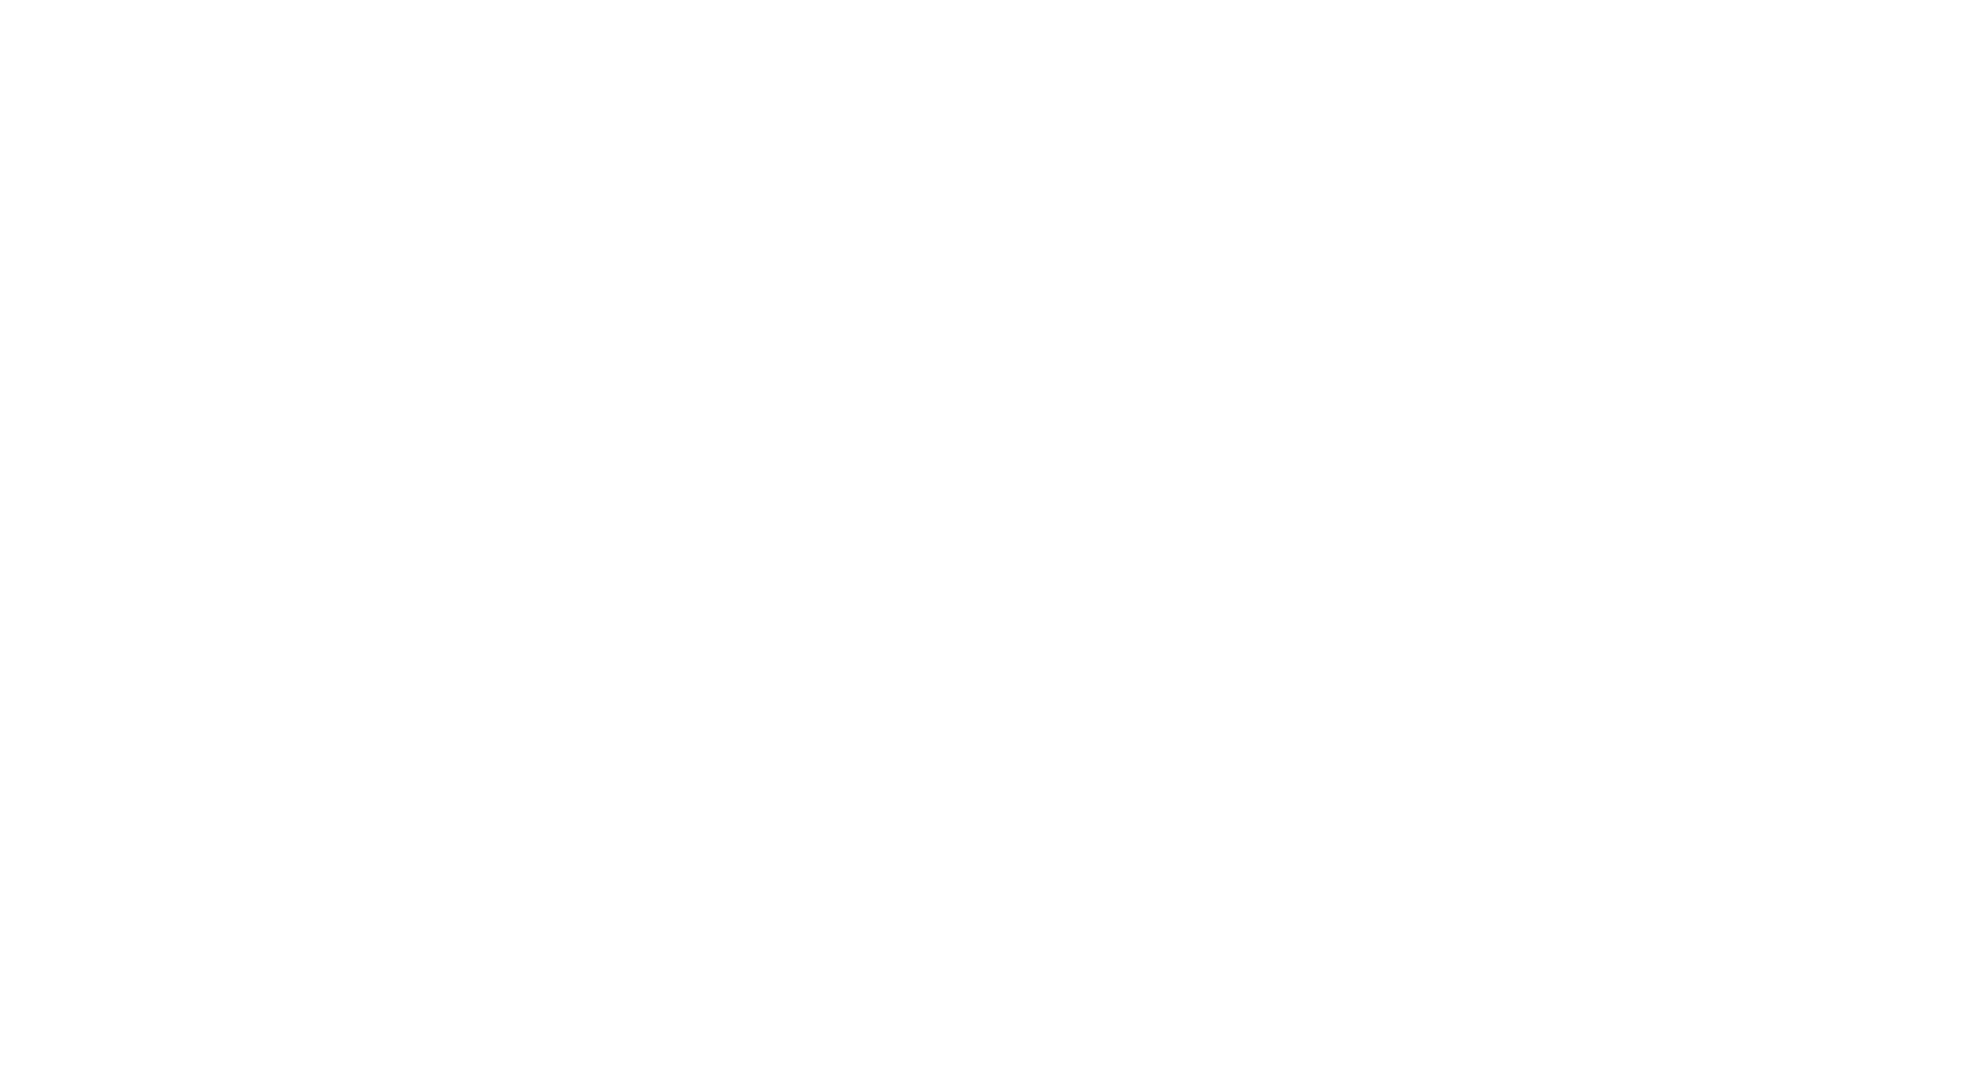 Vetasoft – Unity Assets